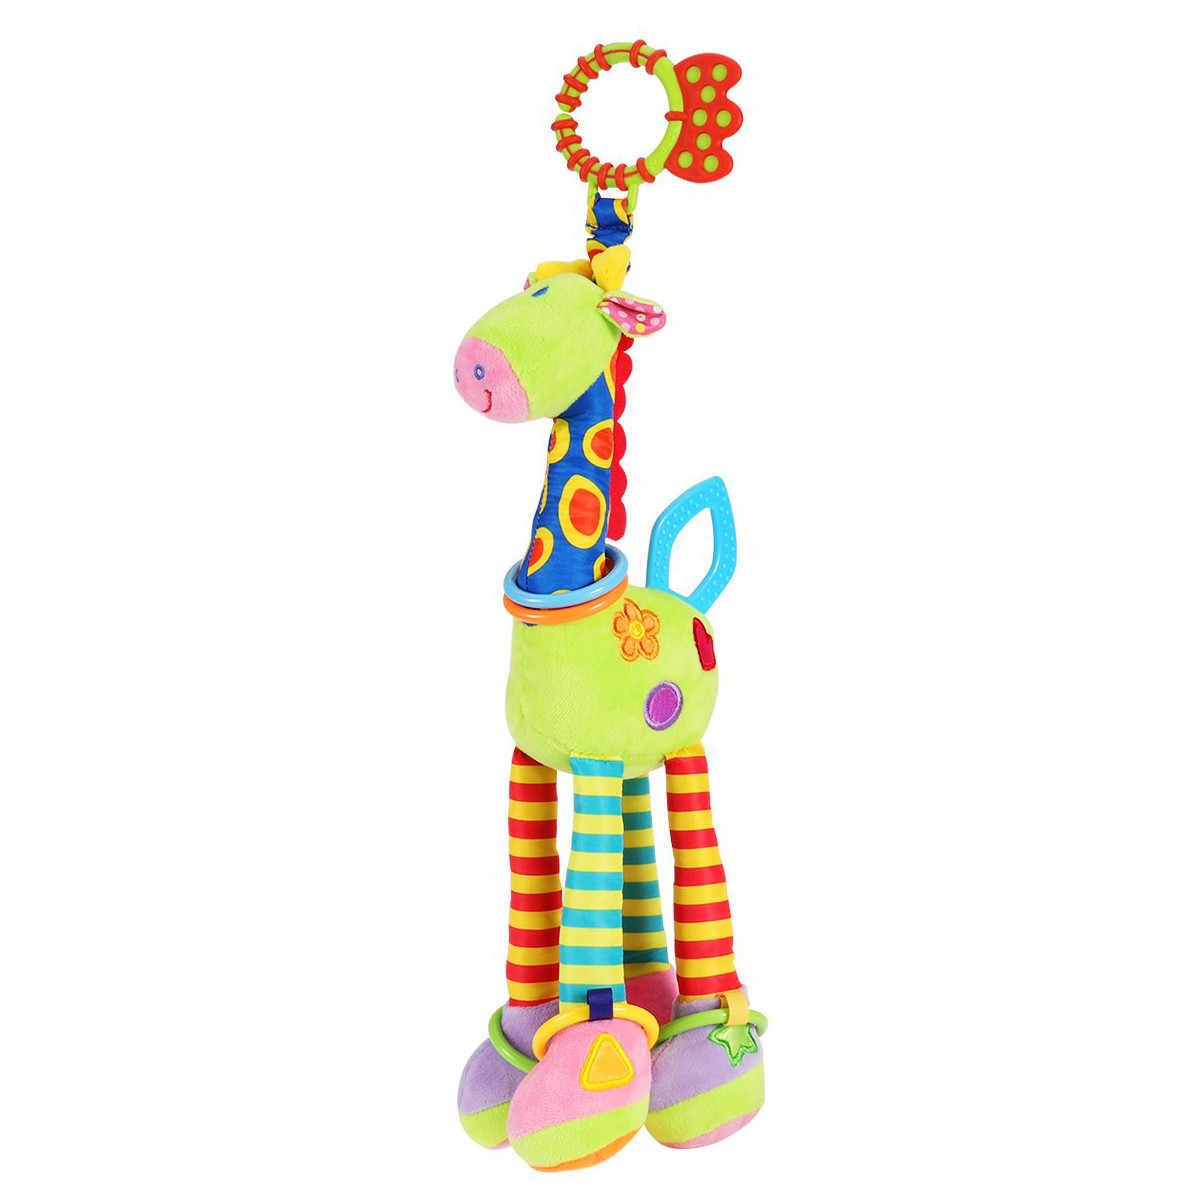 HIINST Pikachu Plush เด็กทารก Spiral รถเข็นเด็กของเล่นลิงช้างการศึกษาตุ๊กตาของเล่นเด็ก Plush MAR20